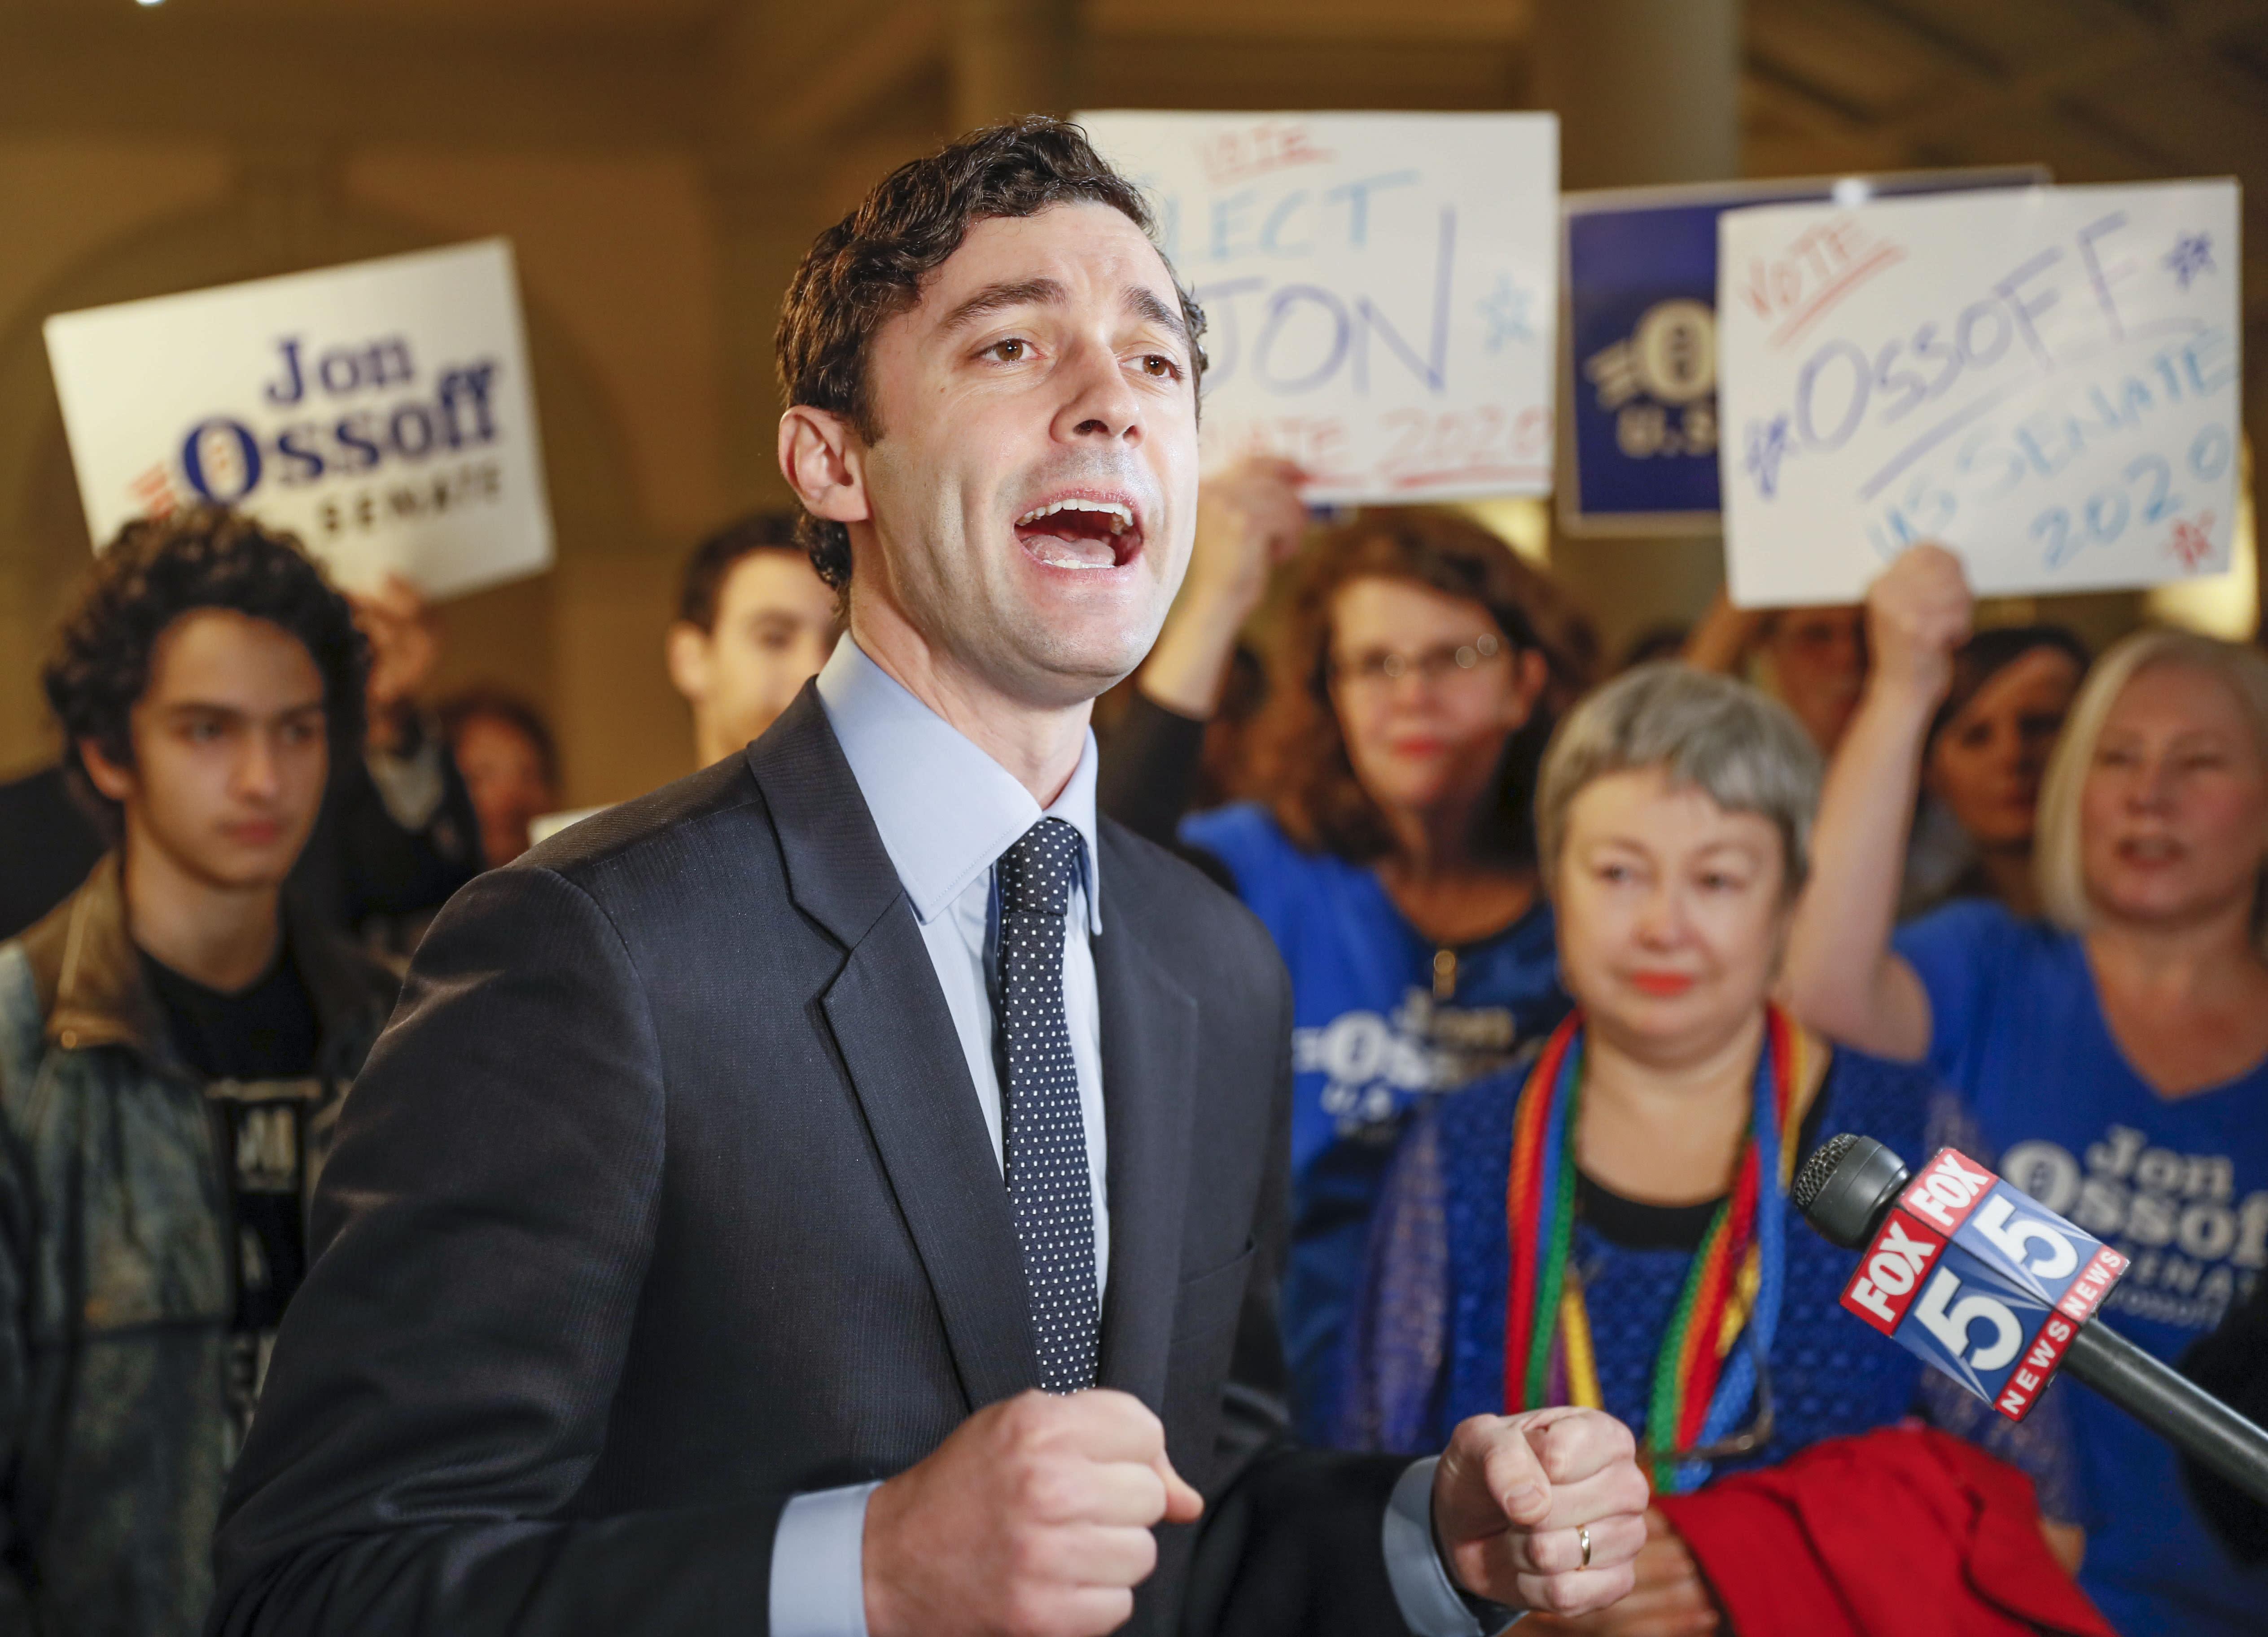 Virus Outbreak Election 2020 Georgia Ossoff